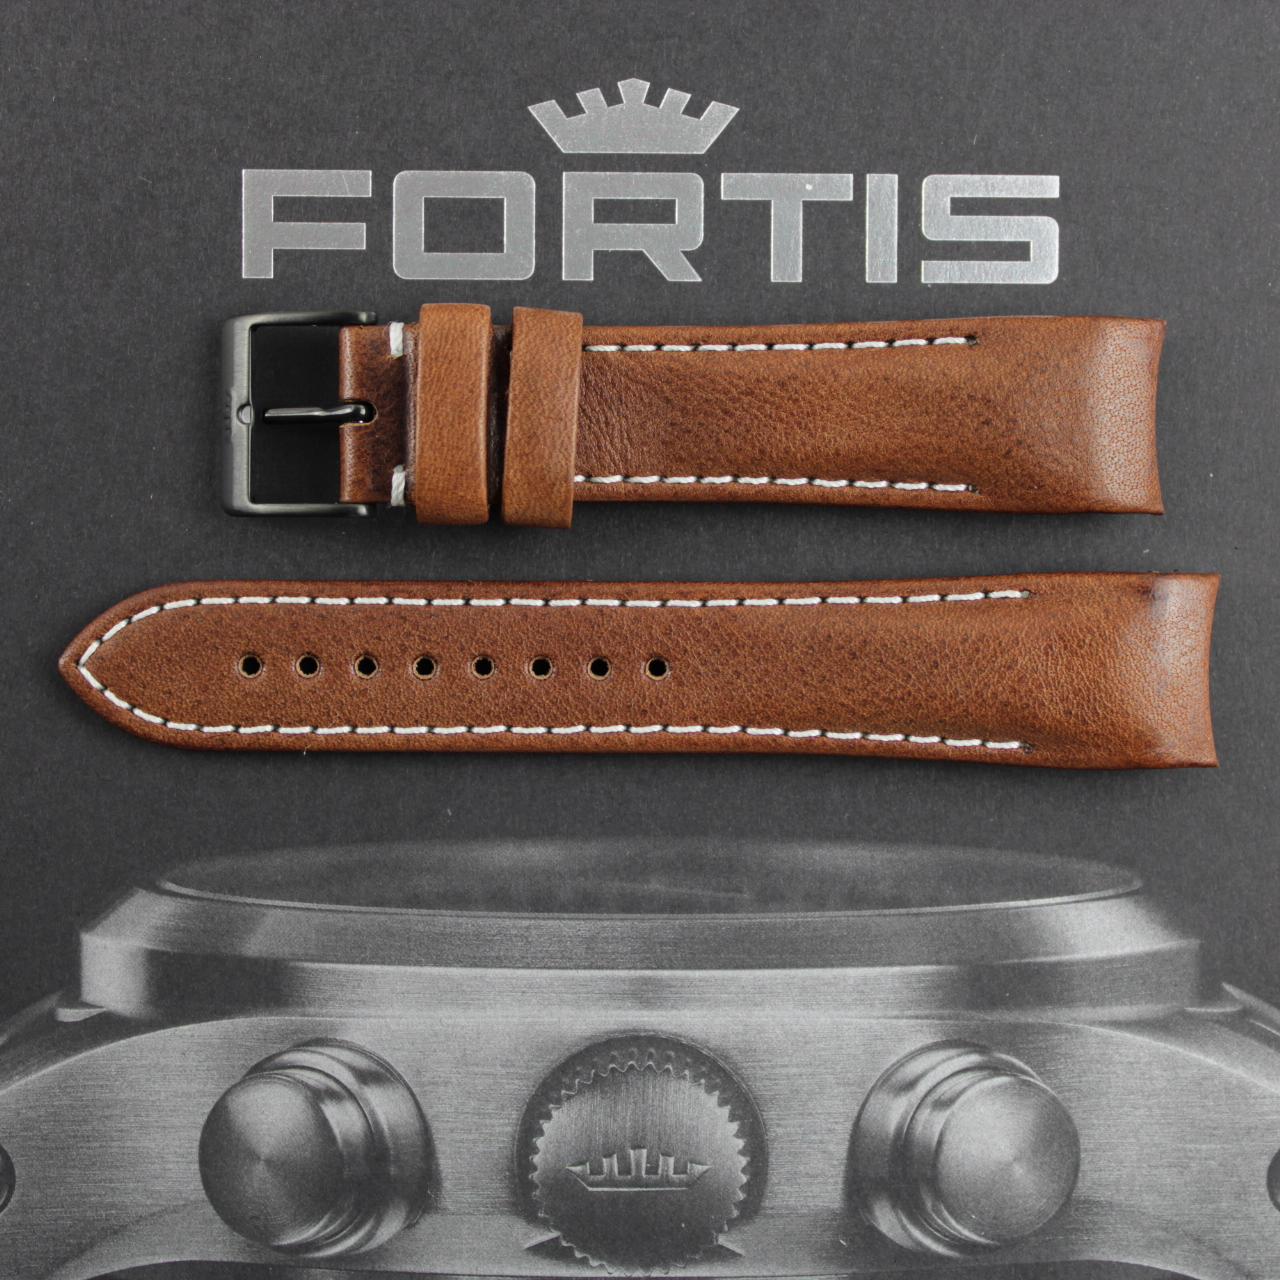 Fortis B-42/ F-43 Integriertes braunes Lederband mit weisser Kontrastnaht. PVD